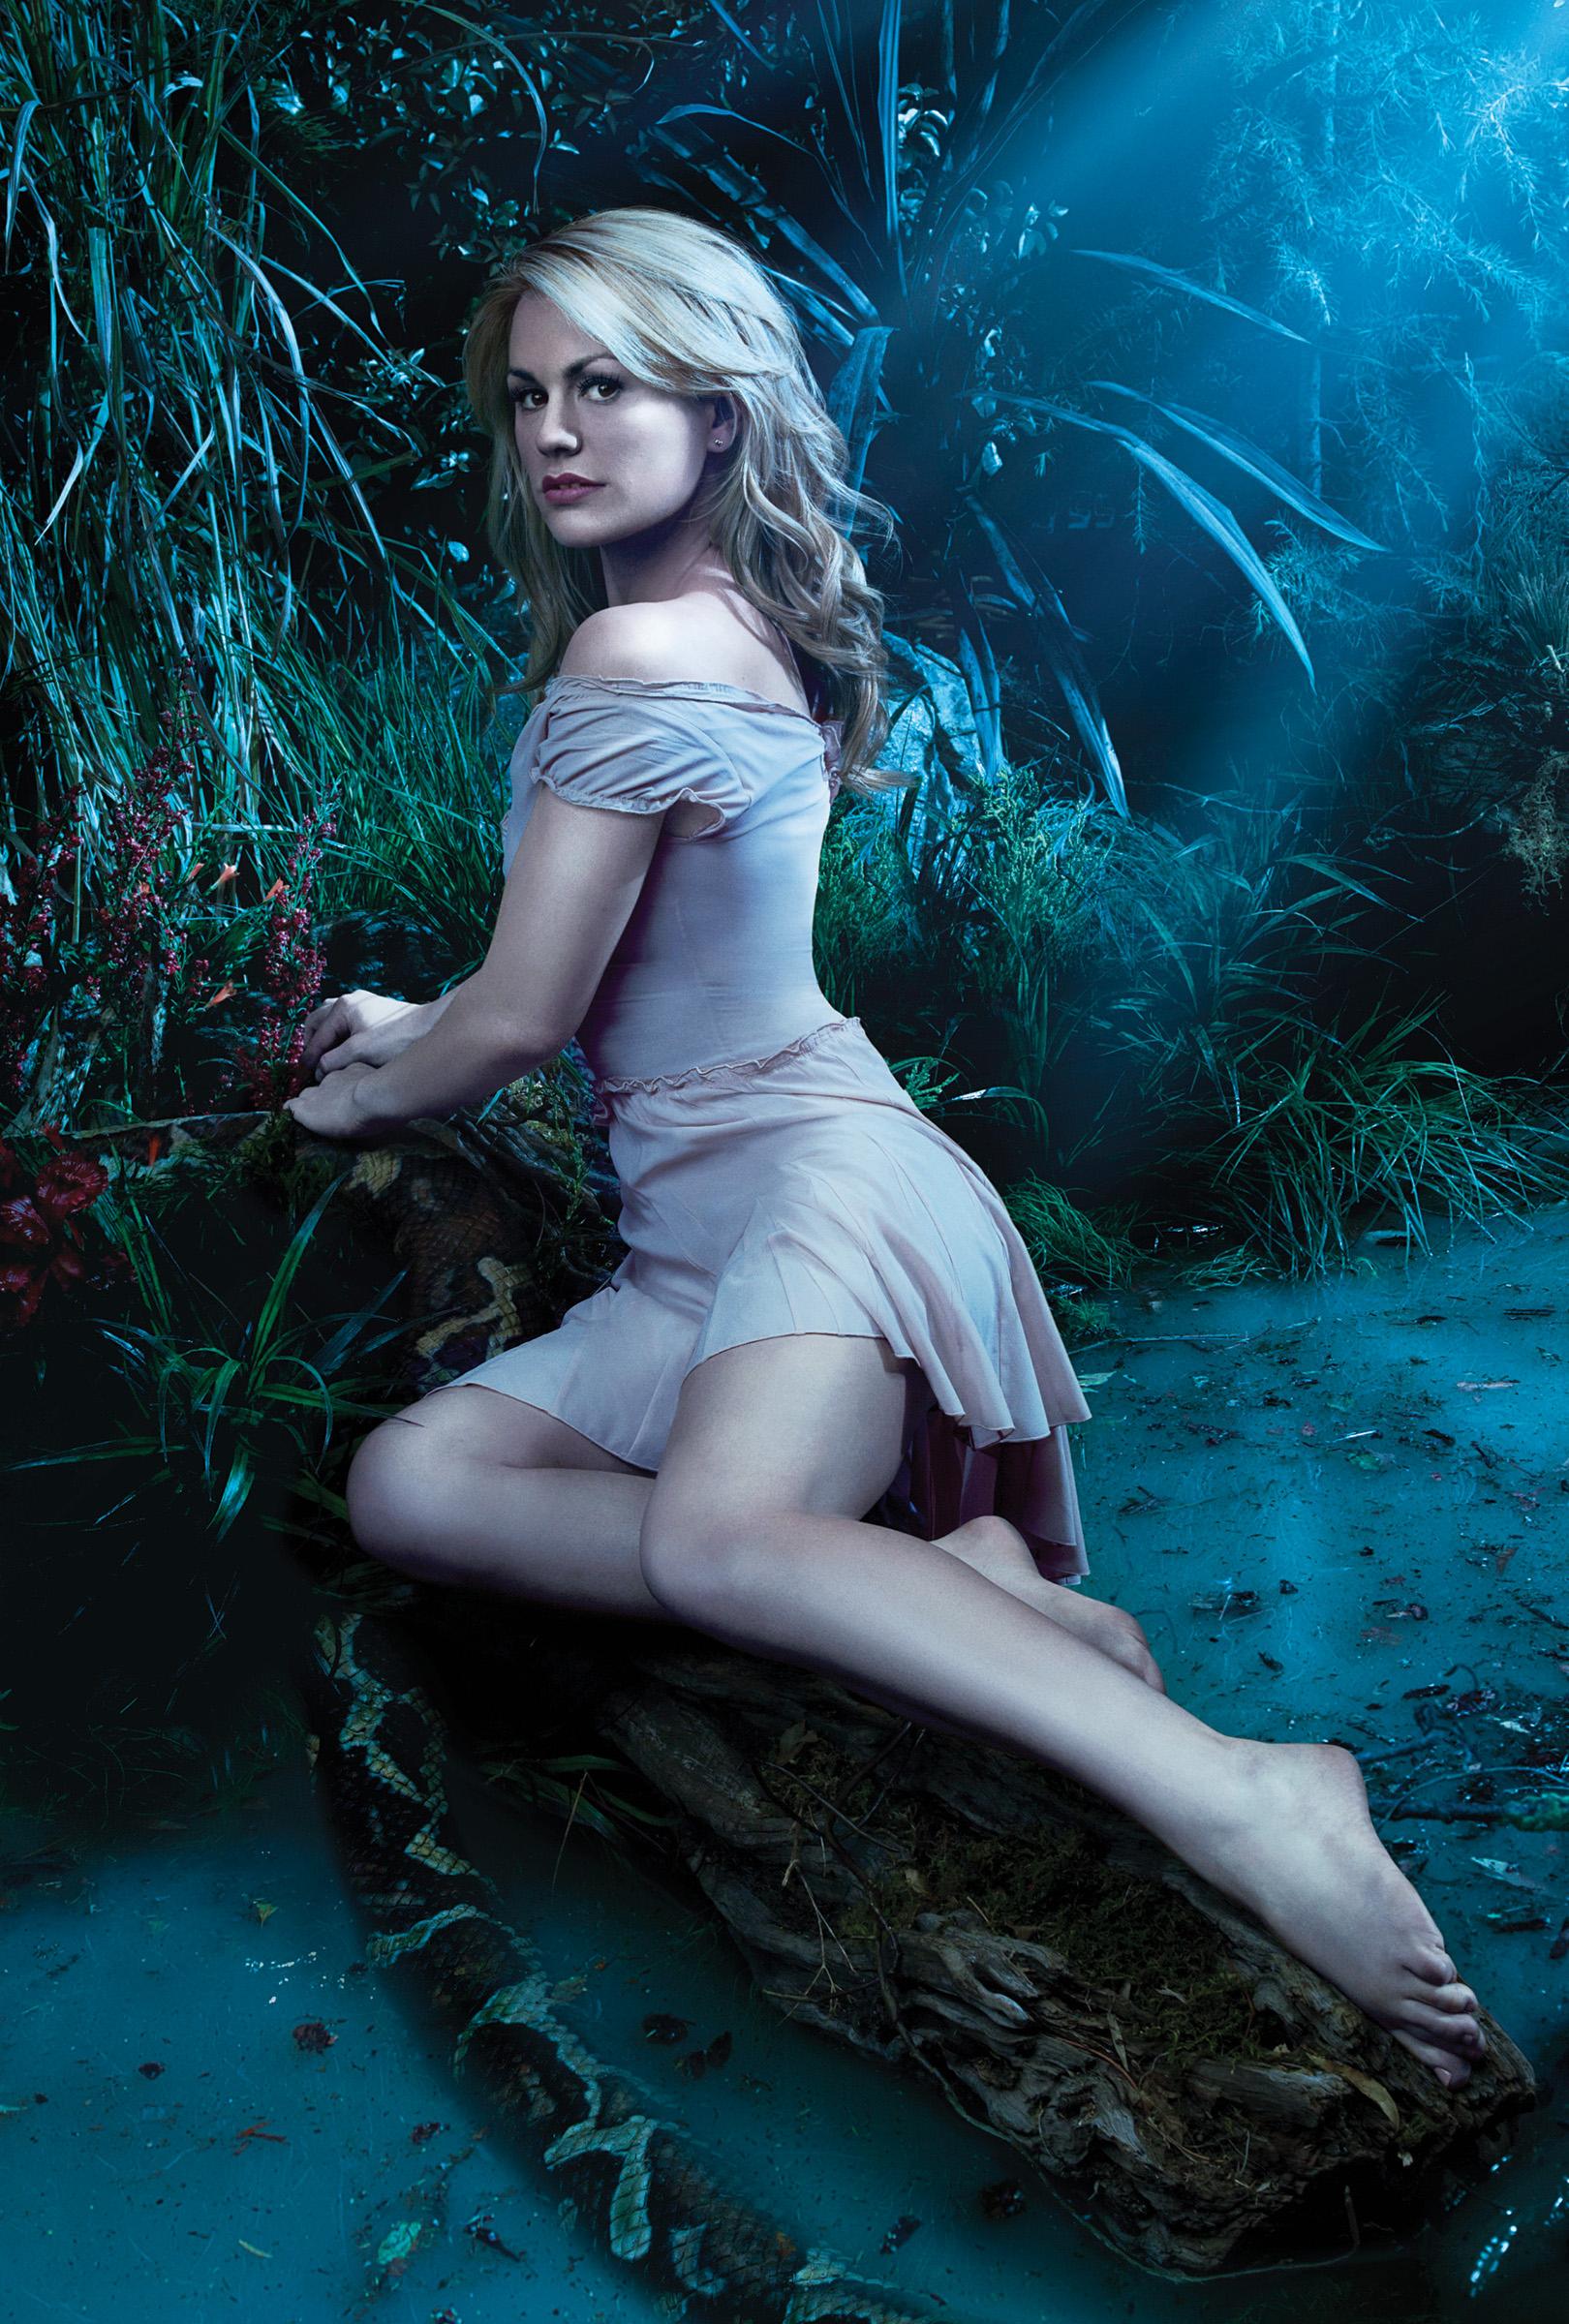 https://pics.wikifeet.com/Anna-Paquin-Feet-645384.jpg